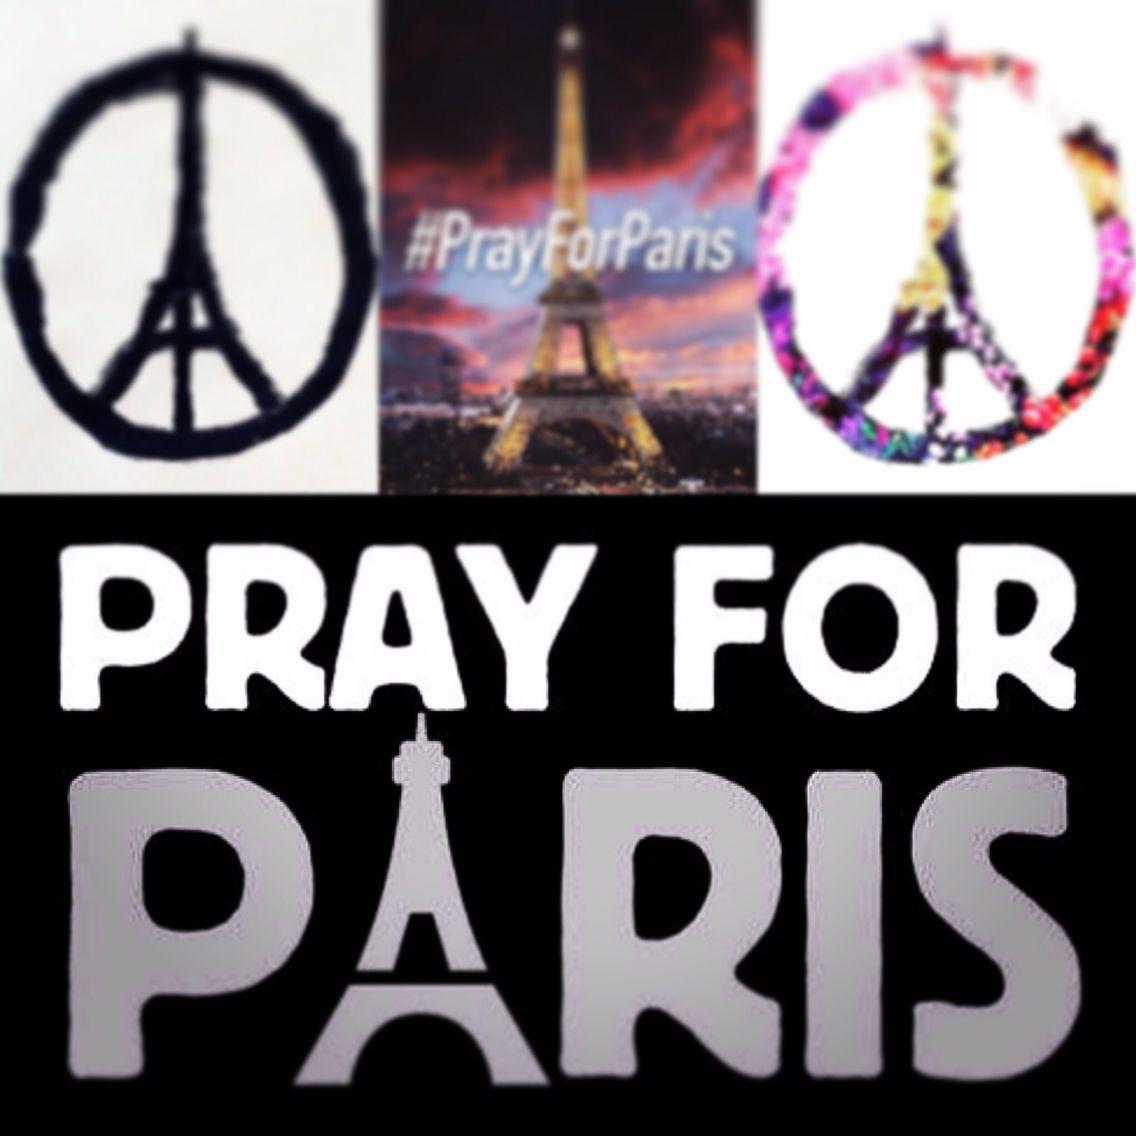 #PrayForParis ❤️